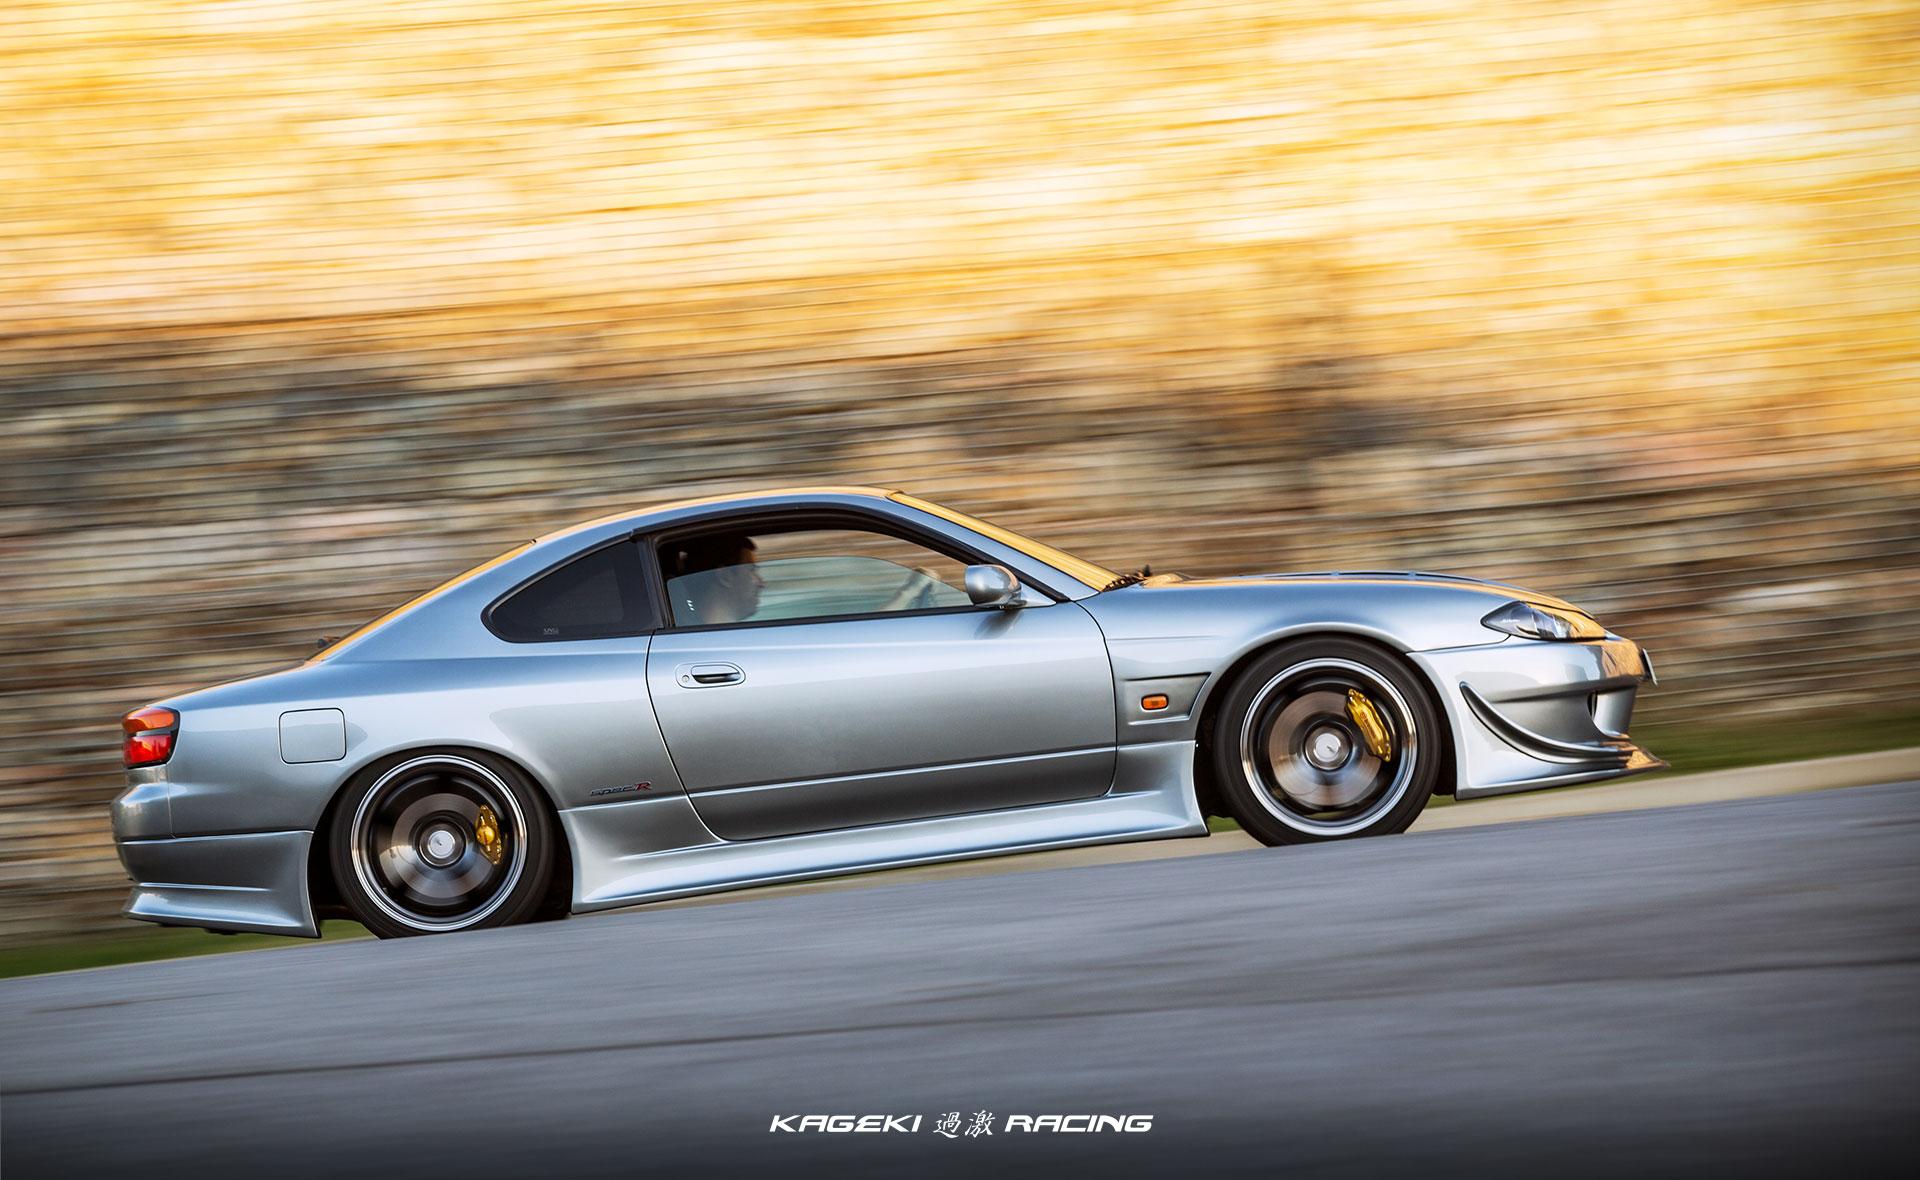 Nissan Silvia S15 For Sale >> Nissan Silvia S15 for Sale Usa - 2018 - 2019 New Car Reviews by Language Kompis